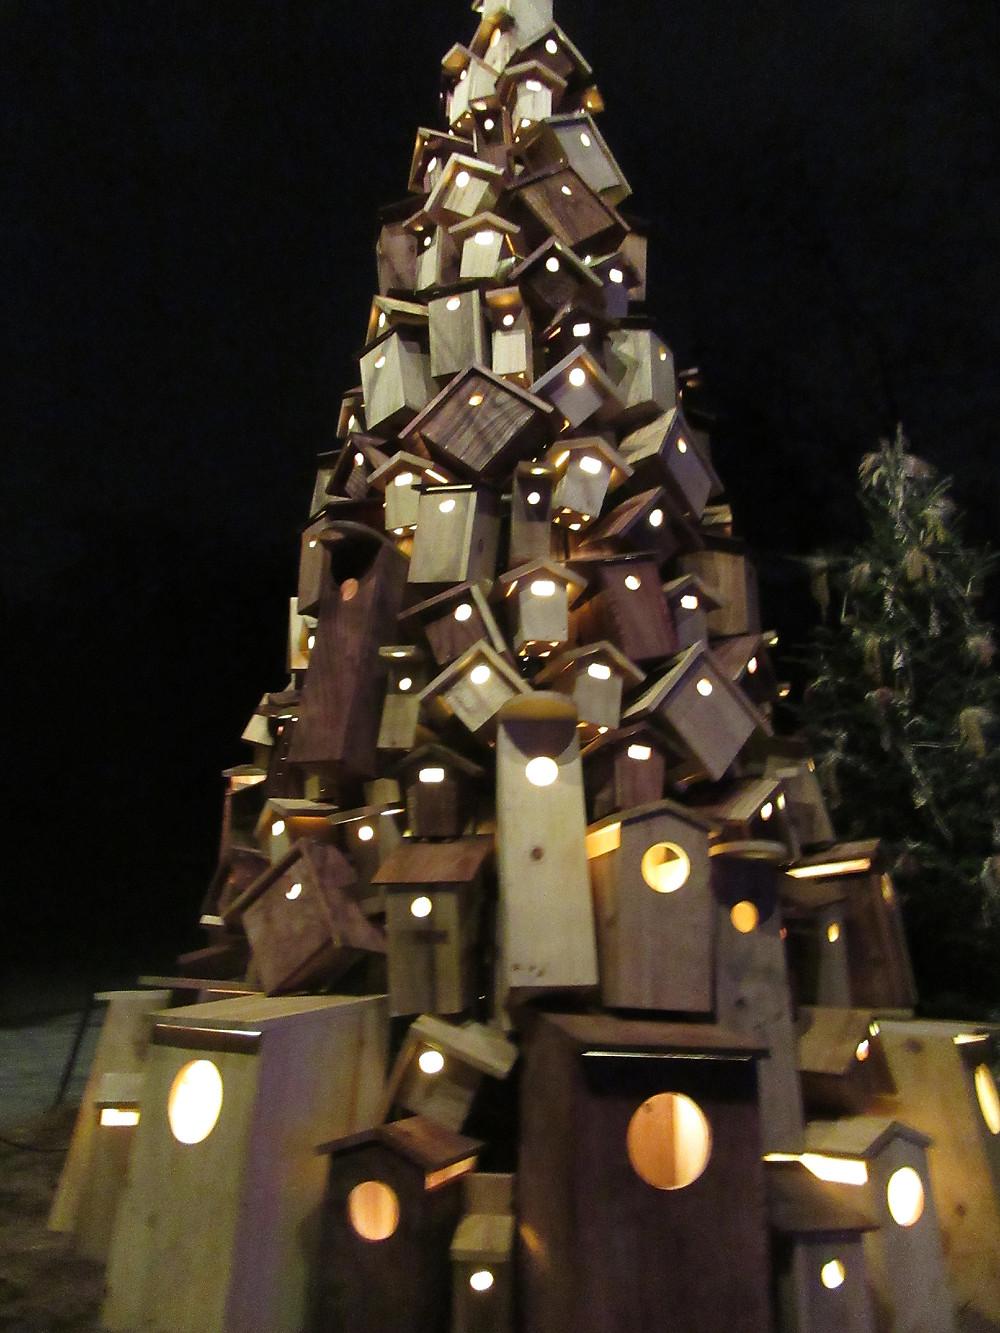 Traveleidoscope:  Birdhouse Christmas Tree, Longwood Gardens, Kennett Square, Pennsylvania